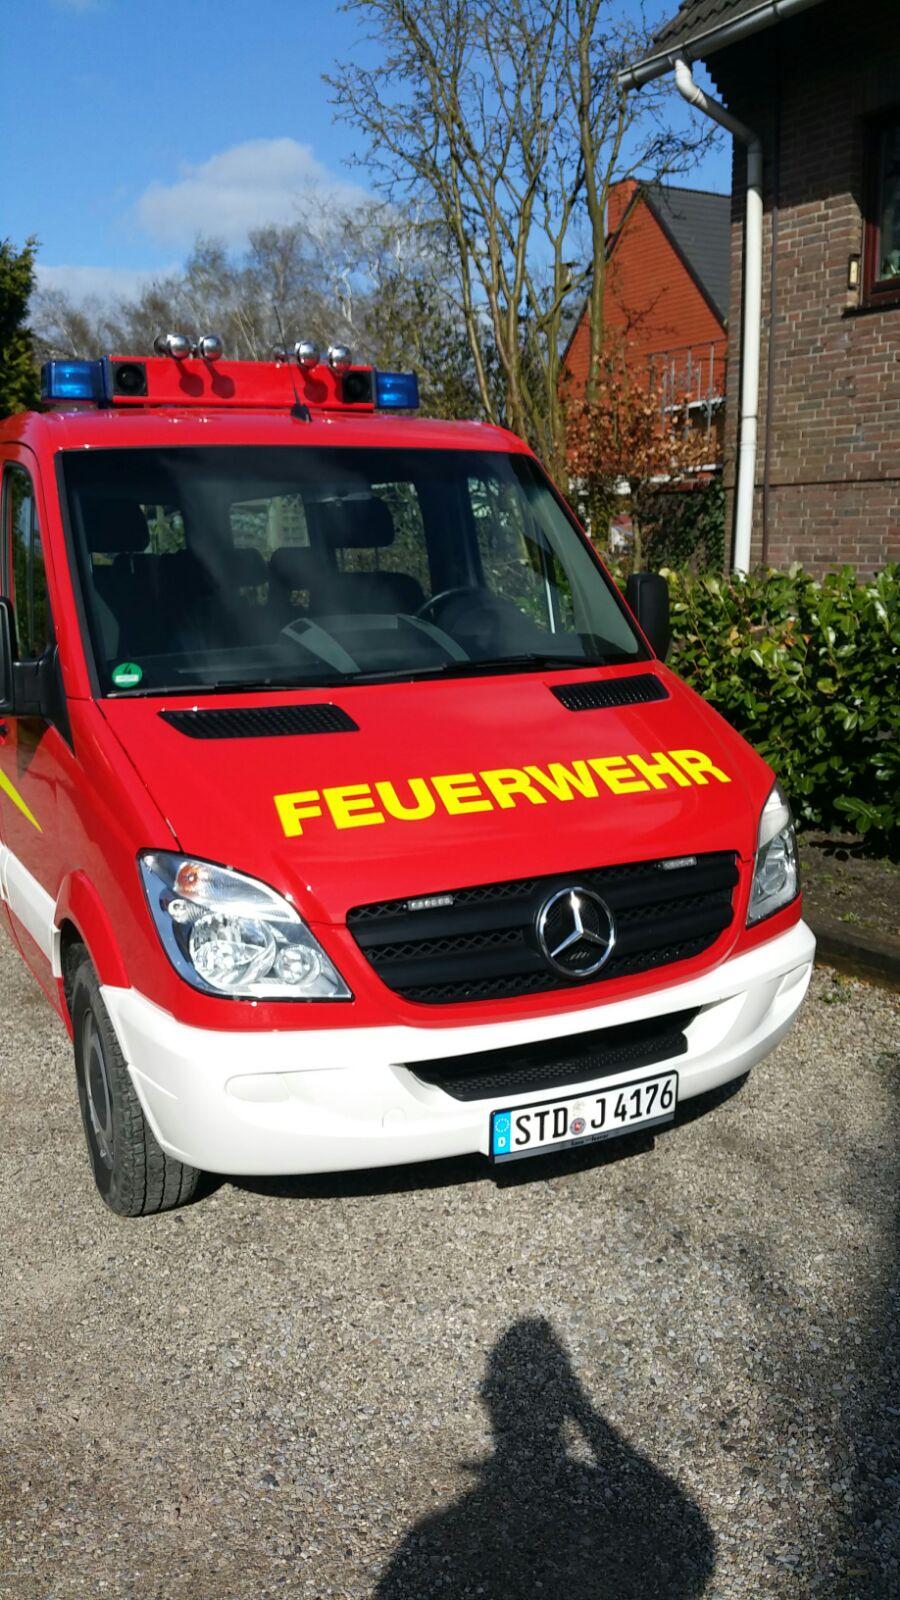 https://www.feuerwehr-buxtehude.de/media/img/bilder_ow_im/bilder_im_fa/mtf/4176c.jpg